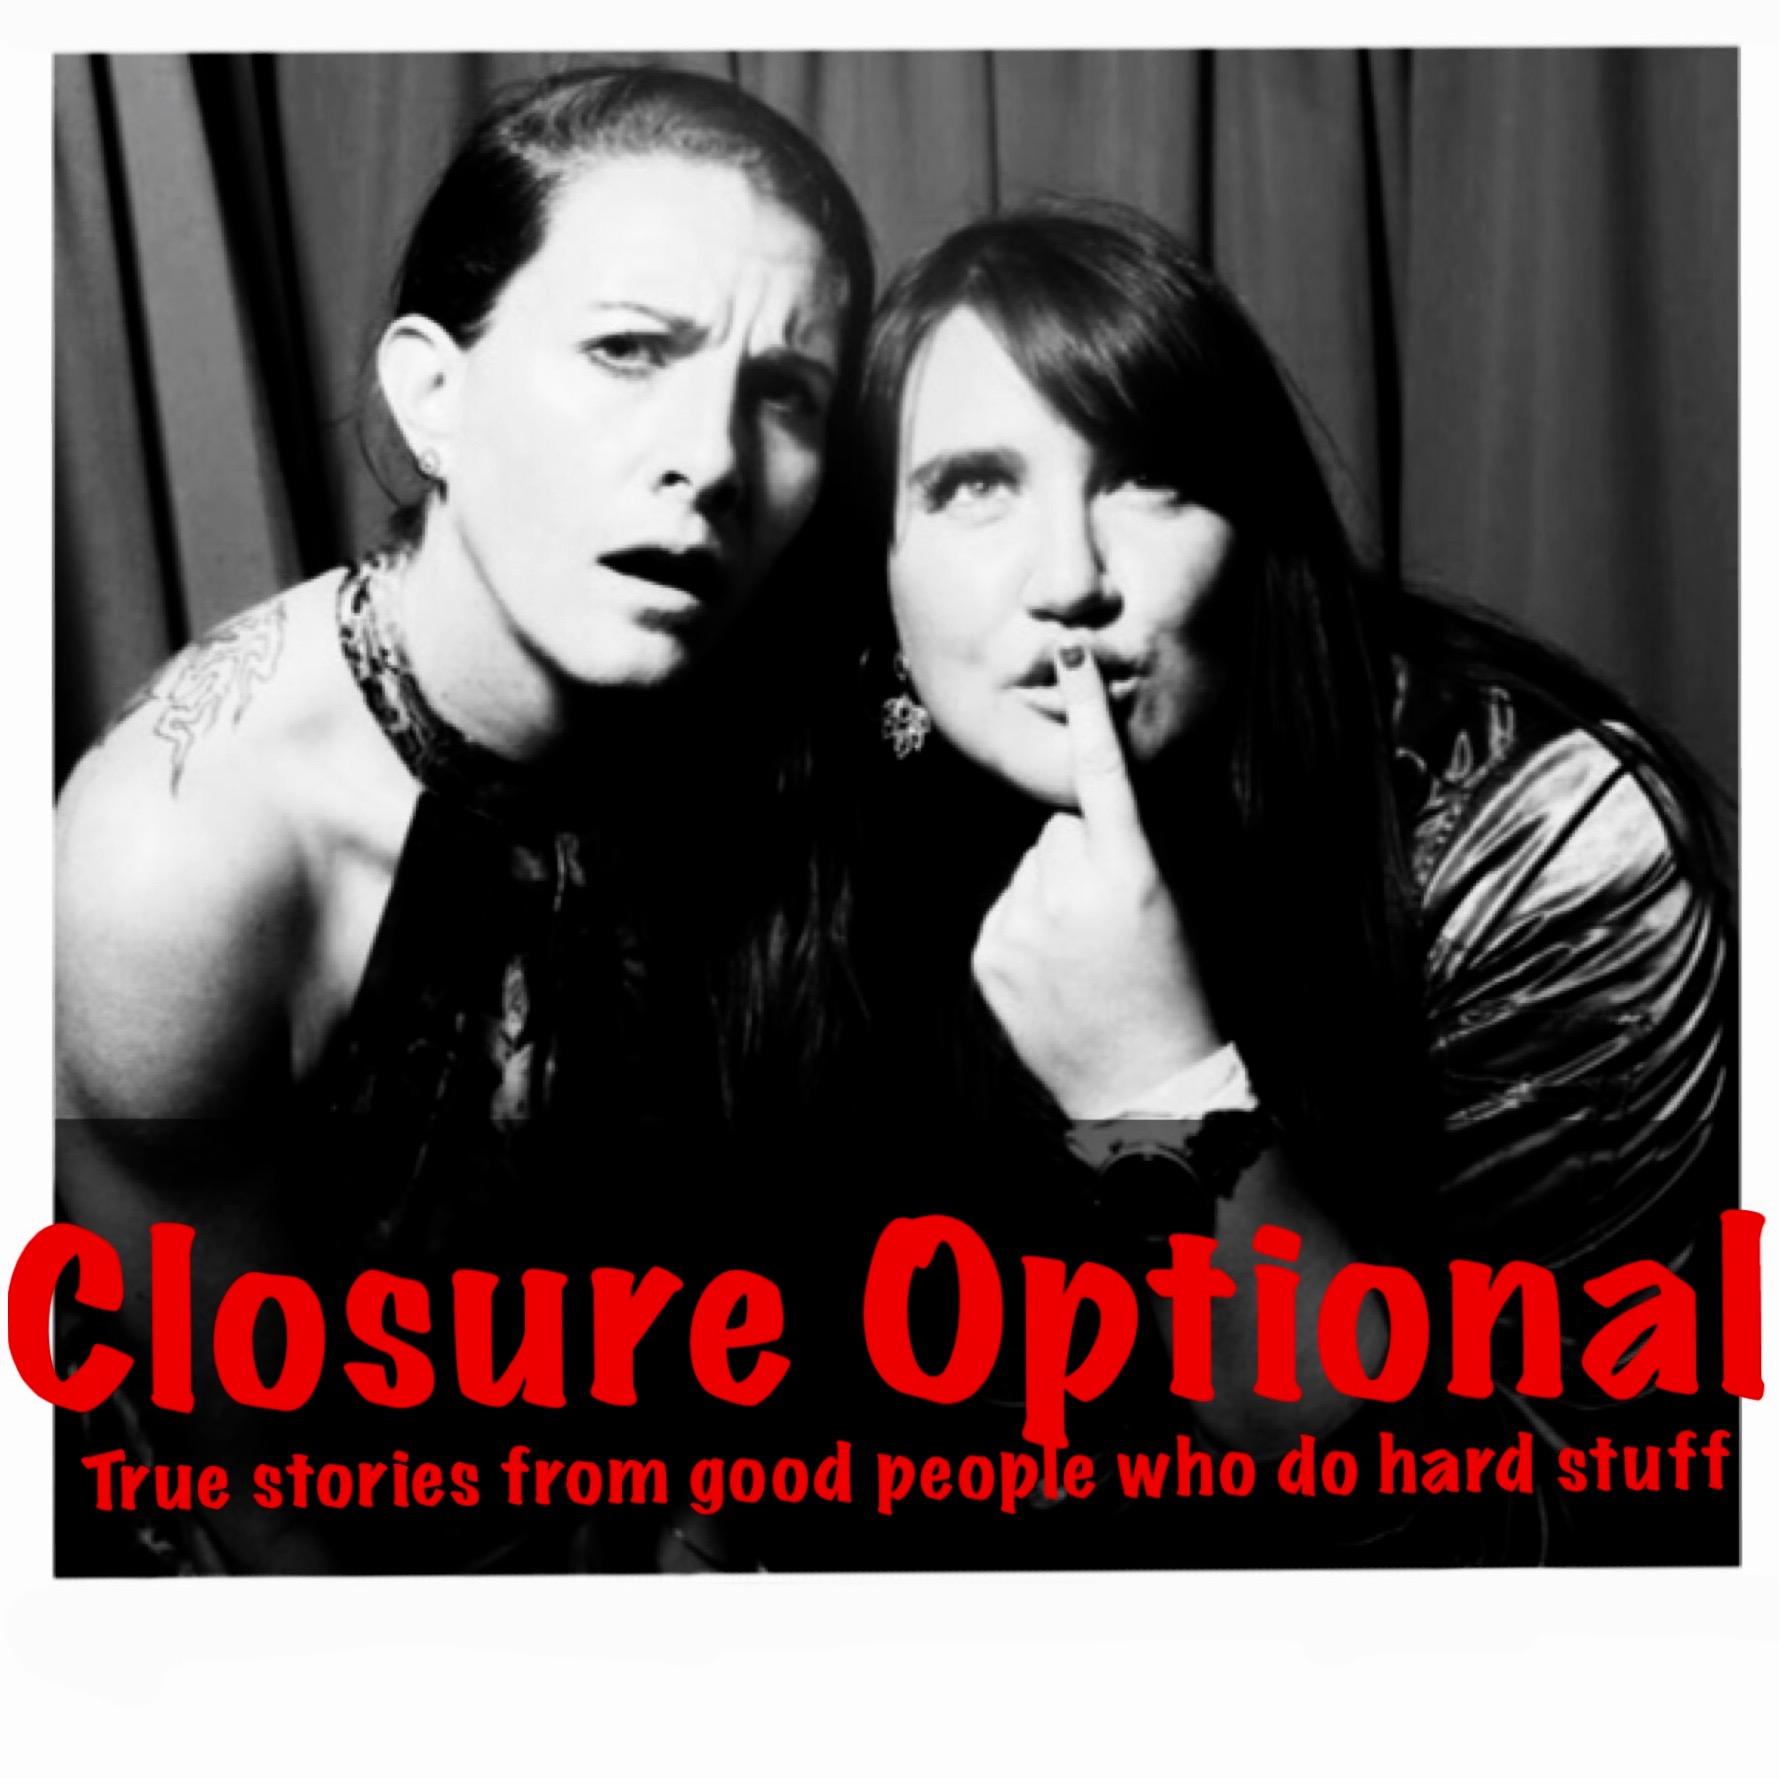 Closure Optional